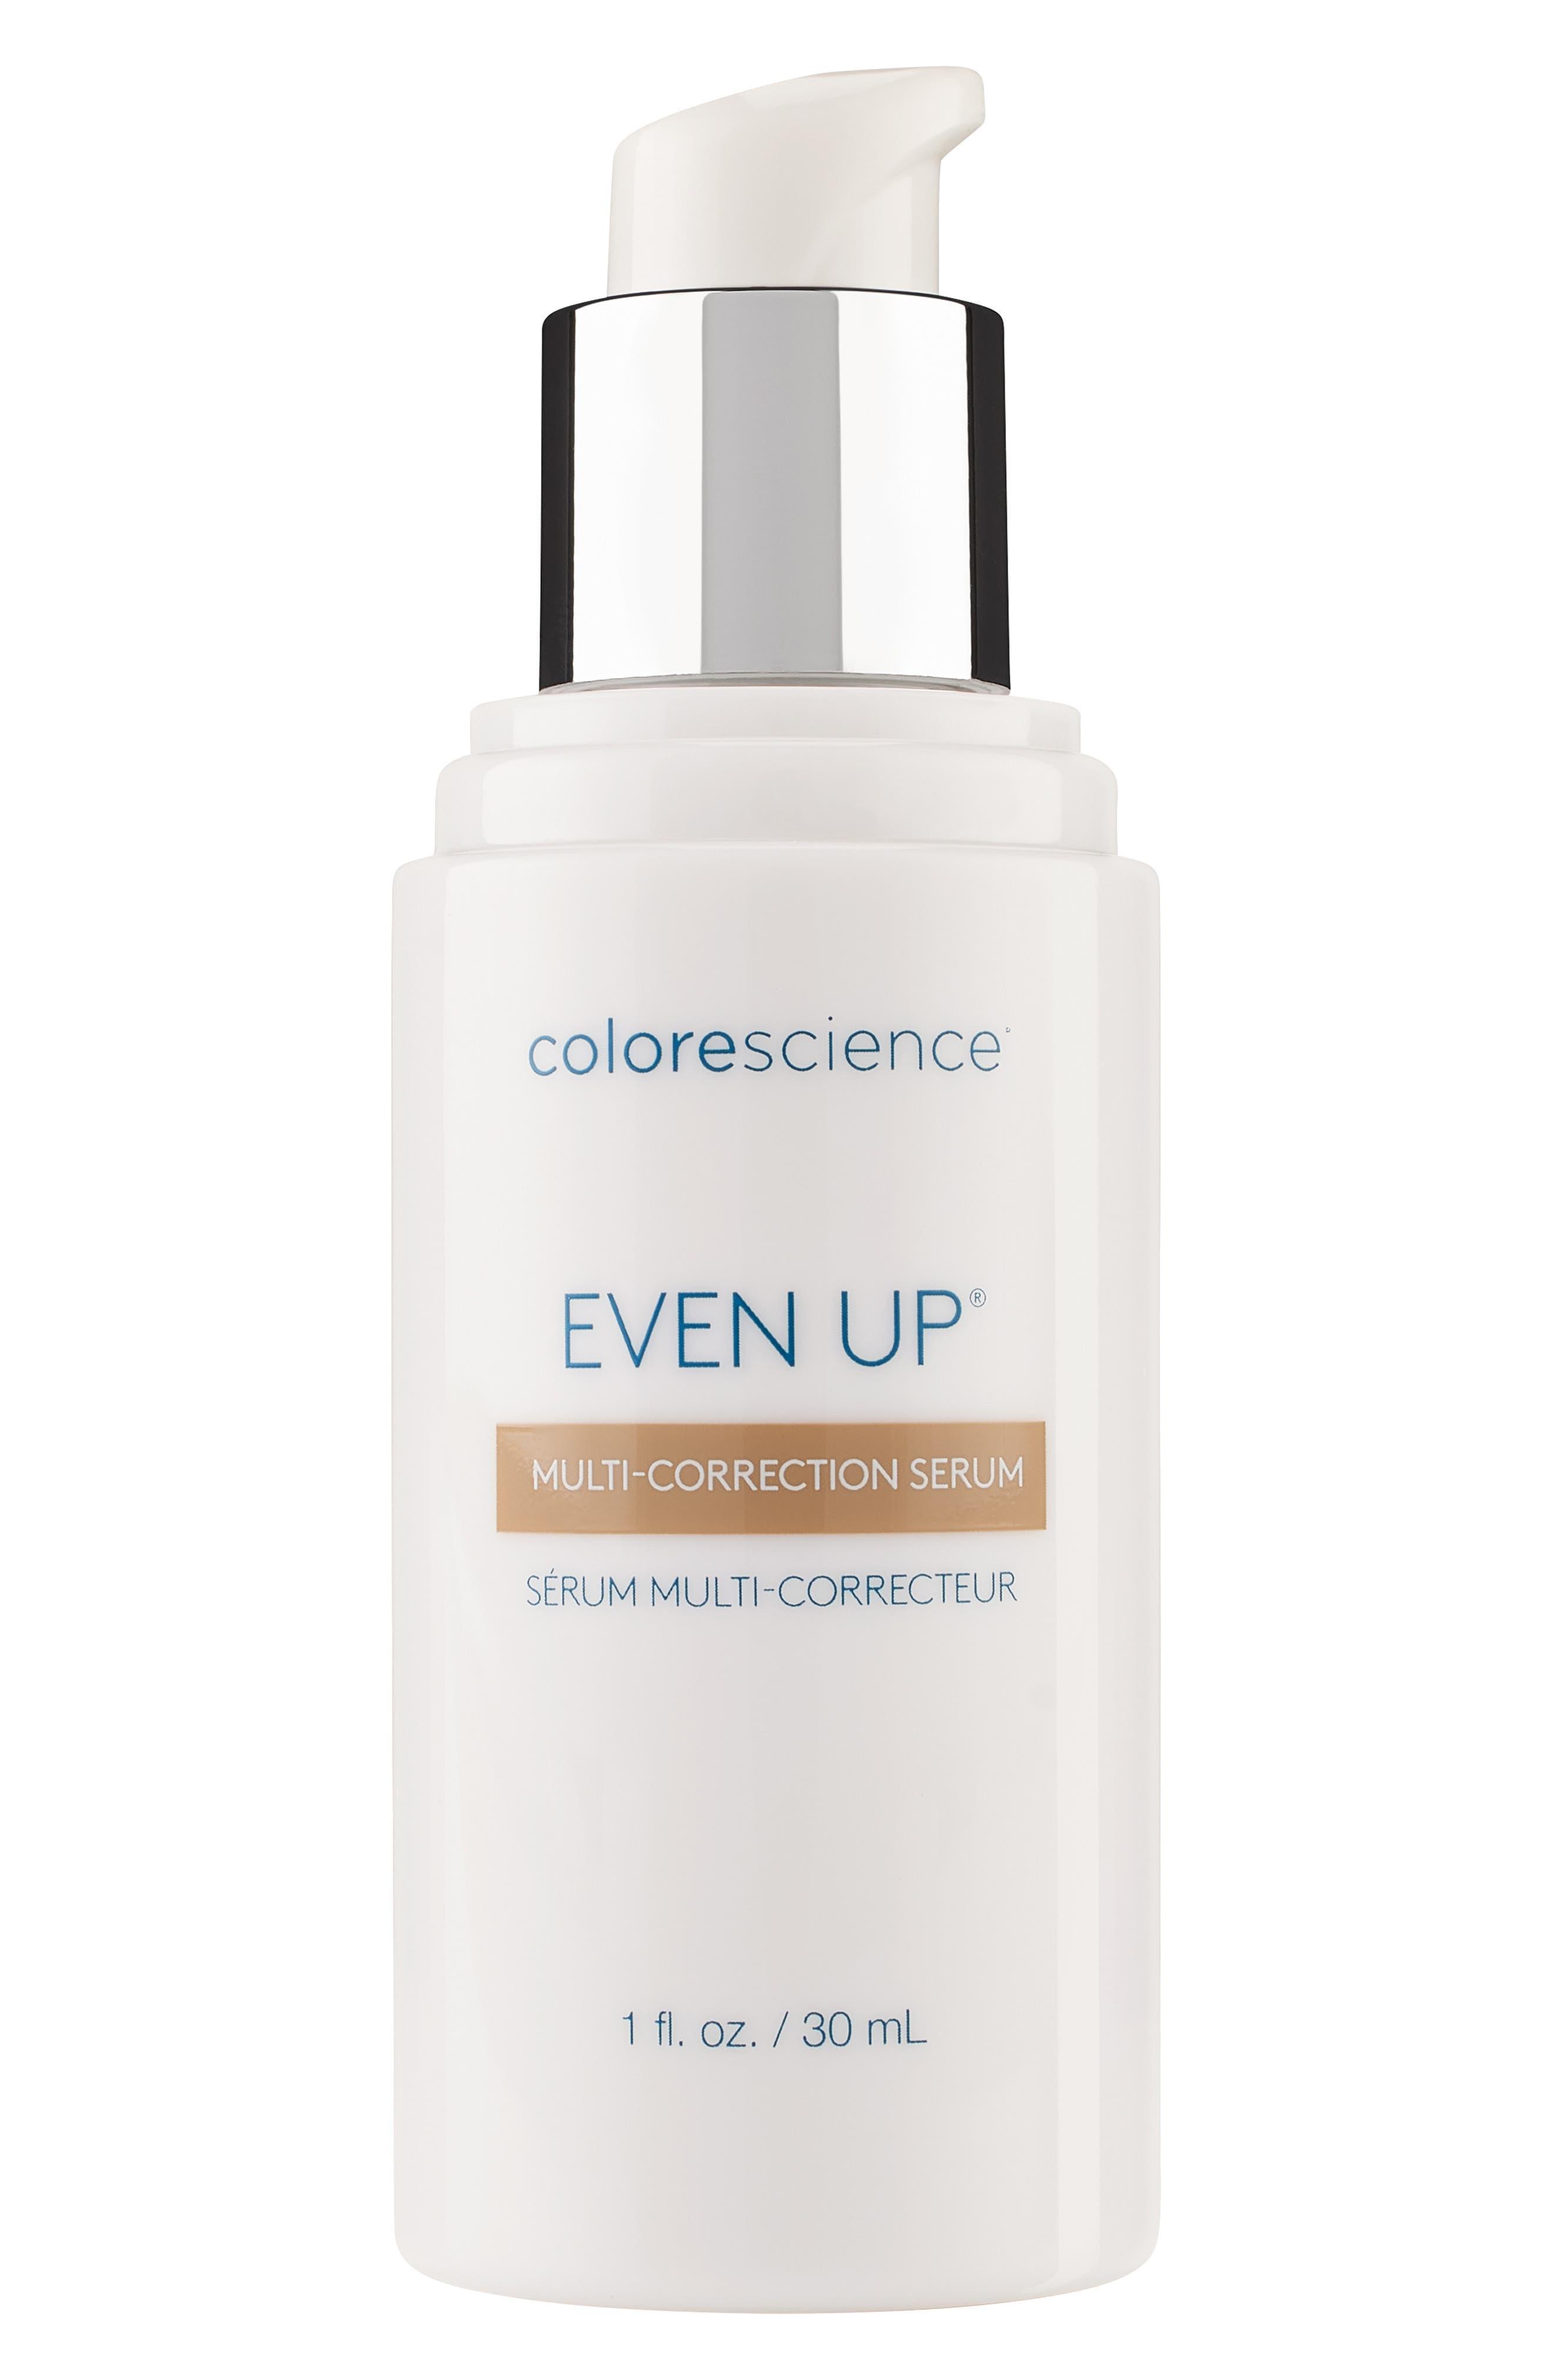 Colorescience Even Up Multi-Correction Serum